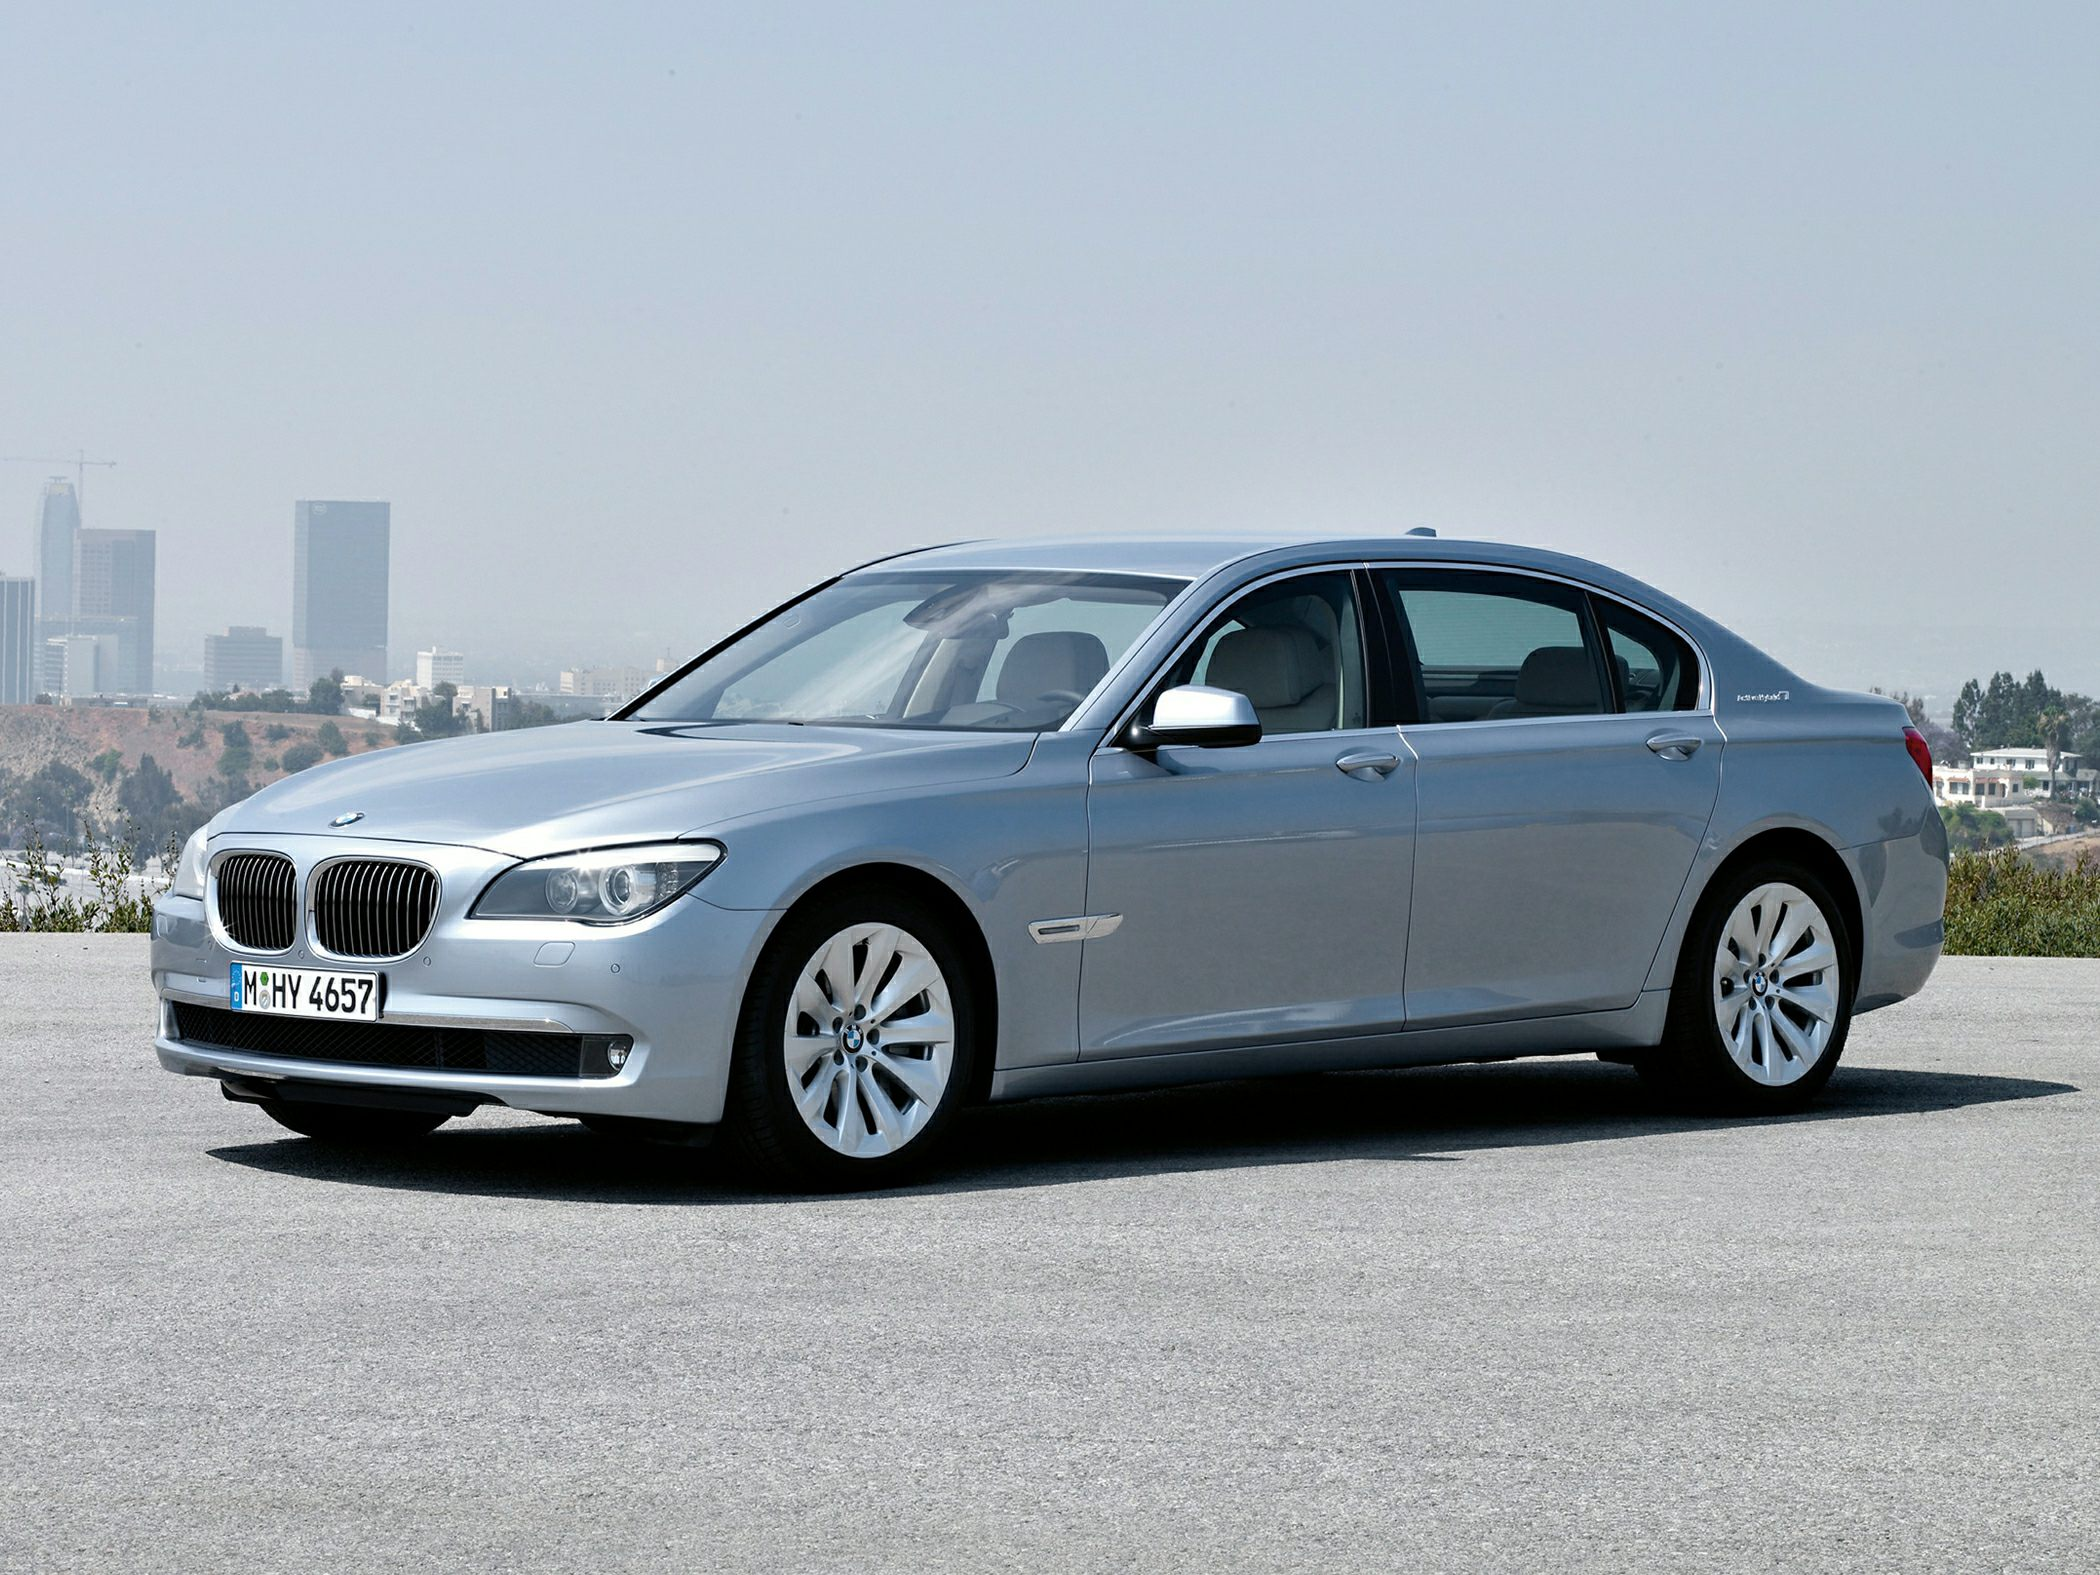 BMW ActiveHybrid 7 Sedan